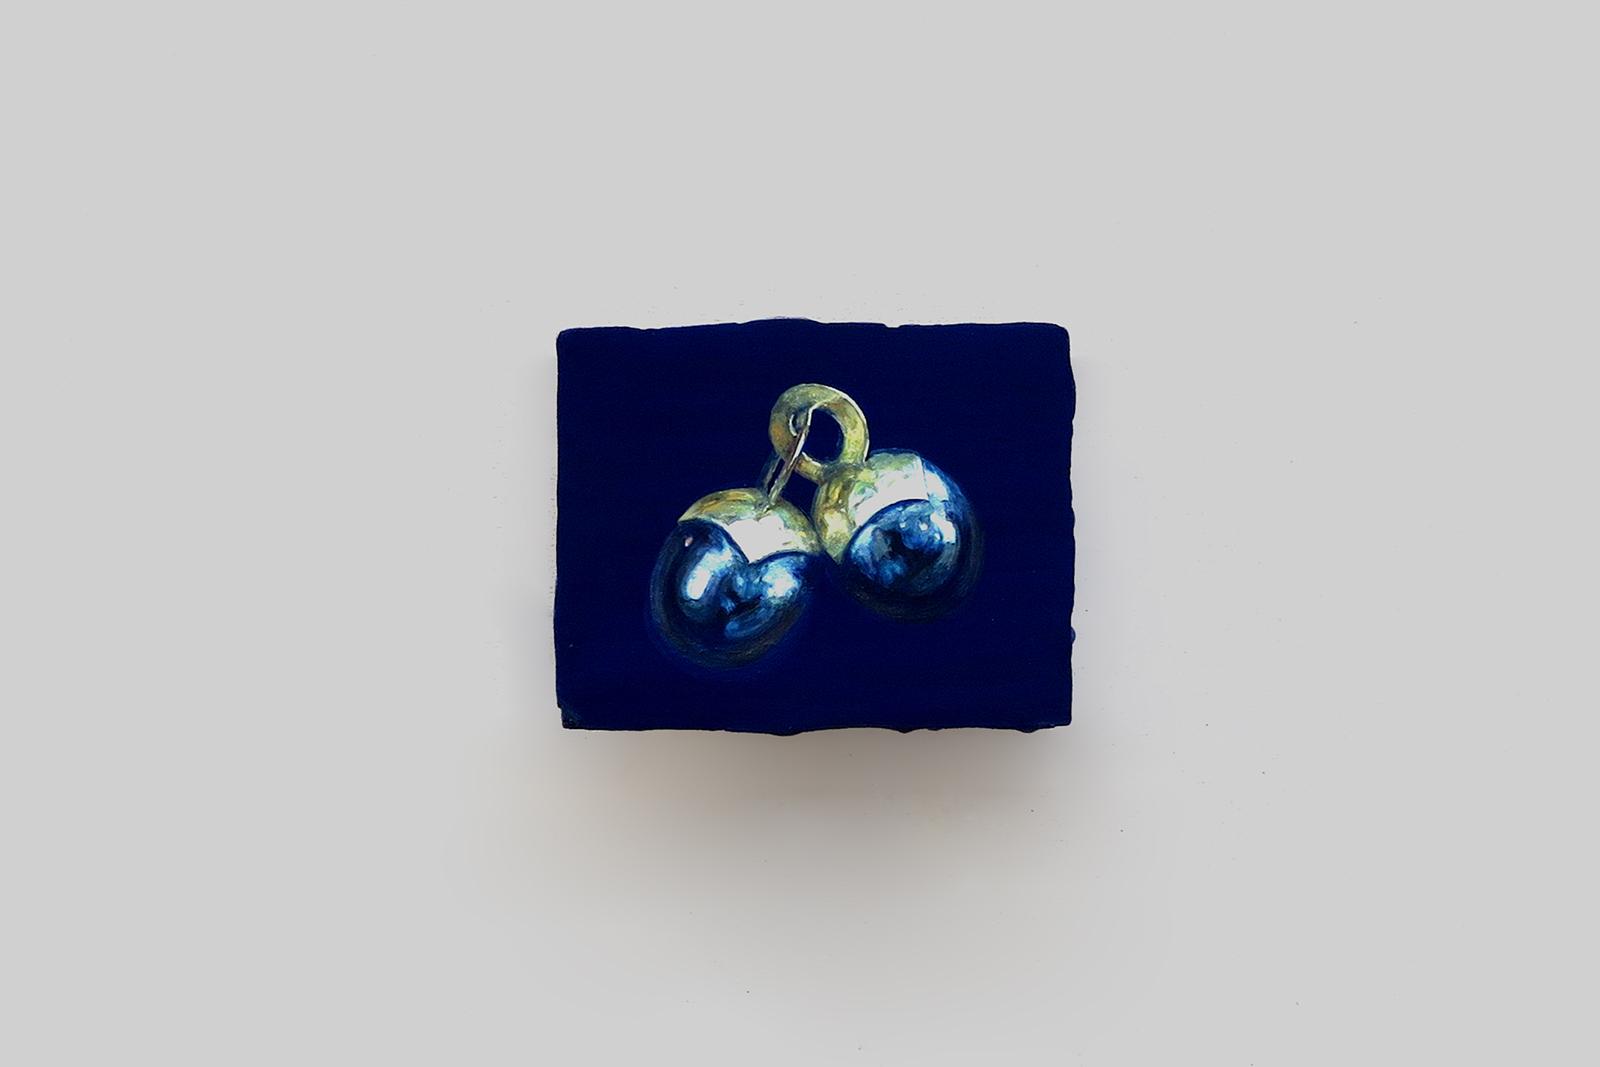 'black pearls' 2015, tempera/paneel, 11 x 14 cm